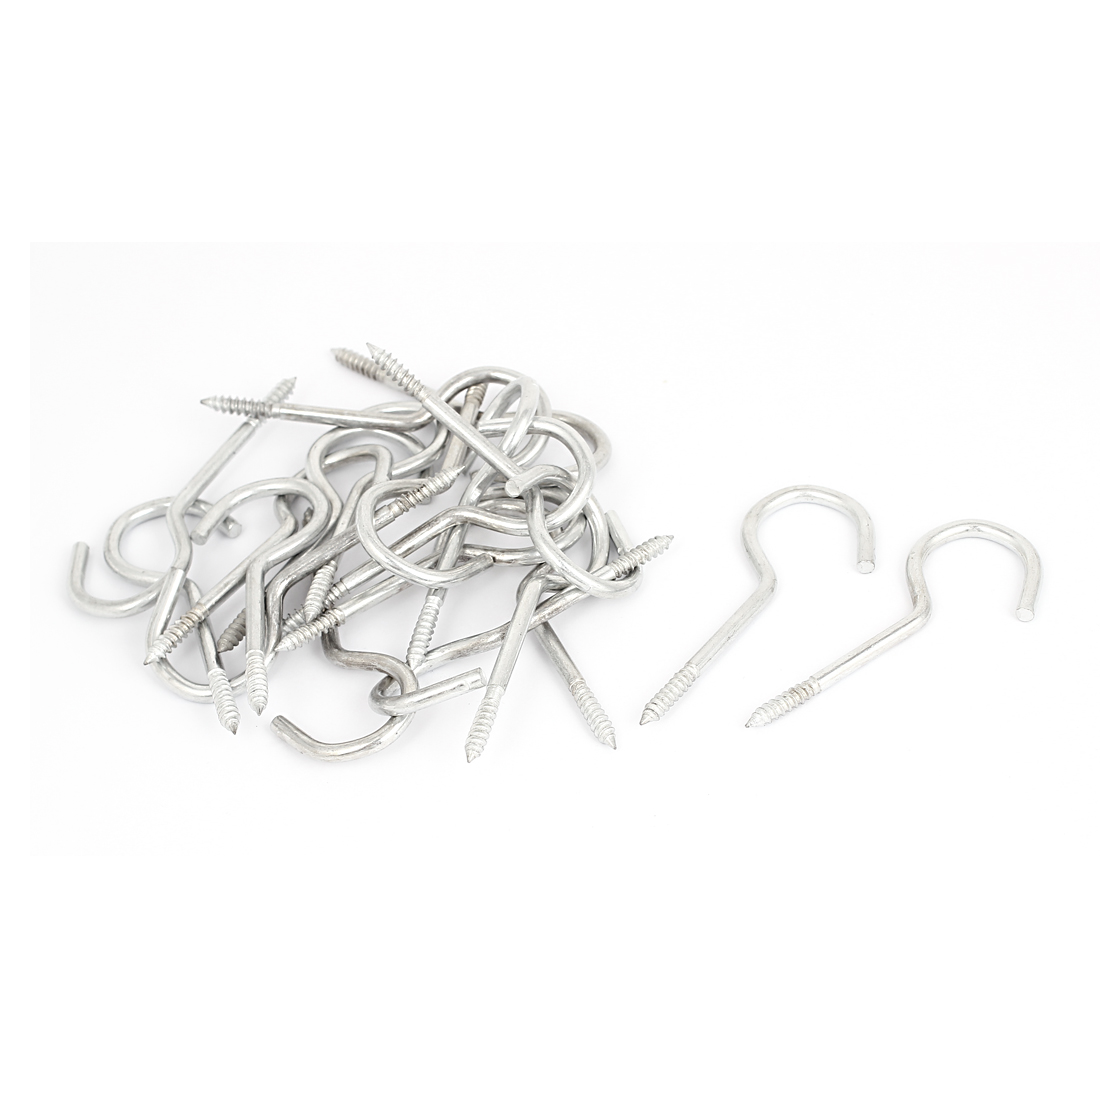 Garden Vine Wire 5mm Dia Thread Zinc Coating Screw Eye Hook Eyelet Bolt 20pcs